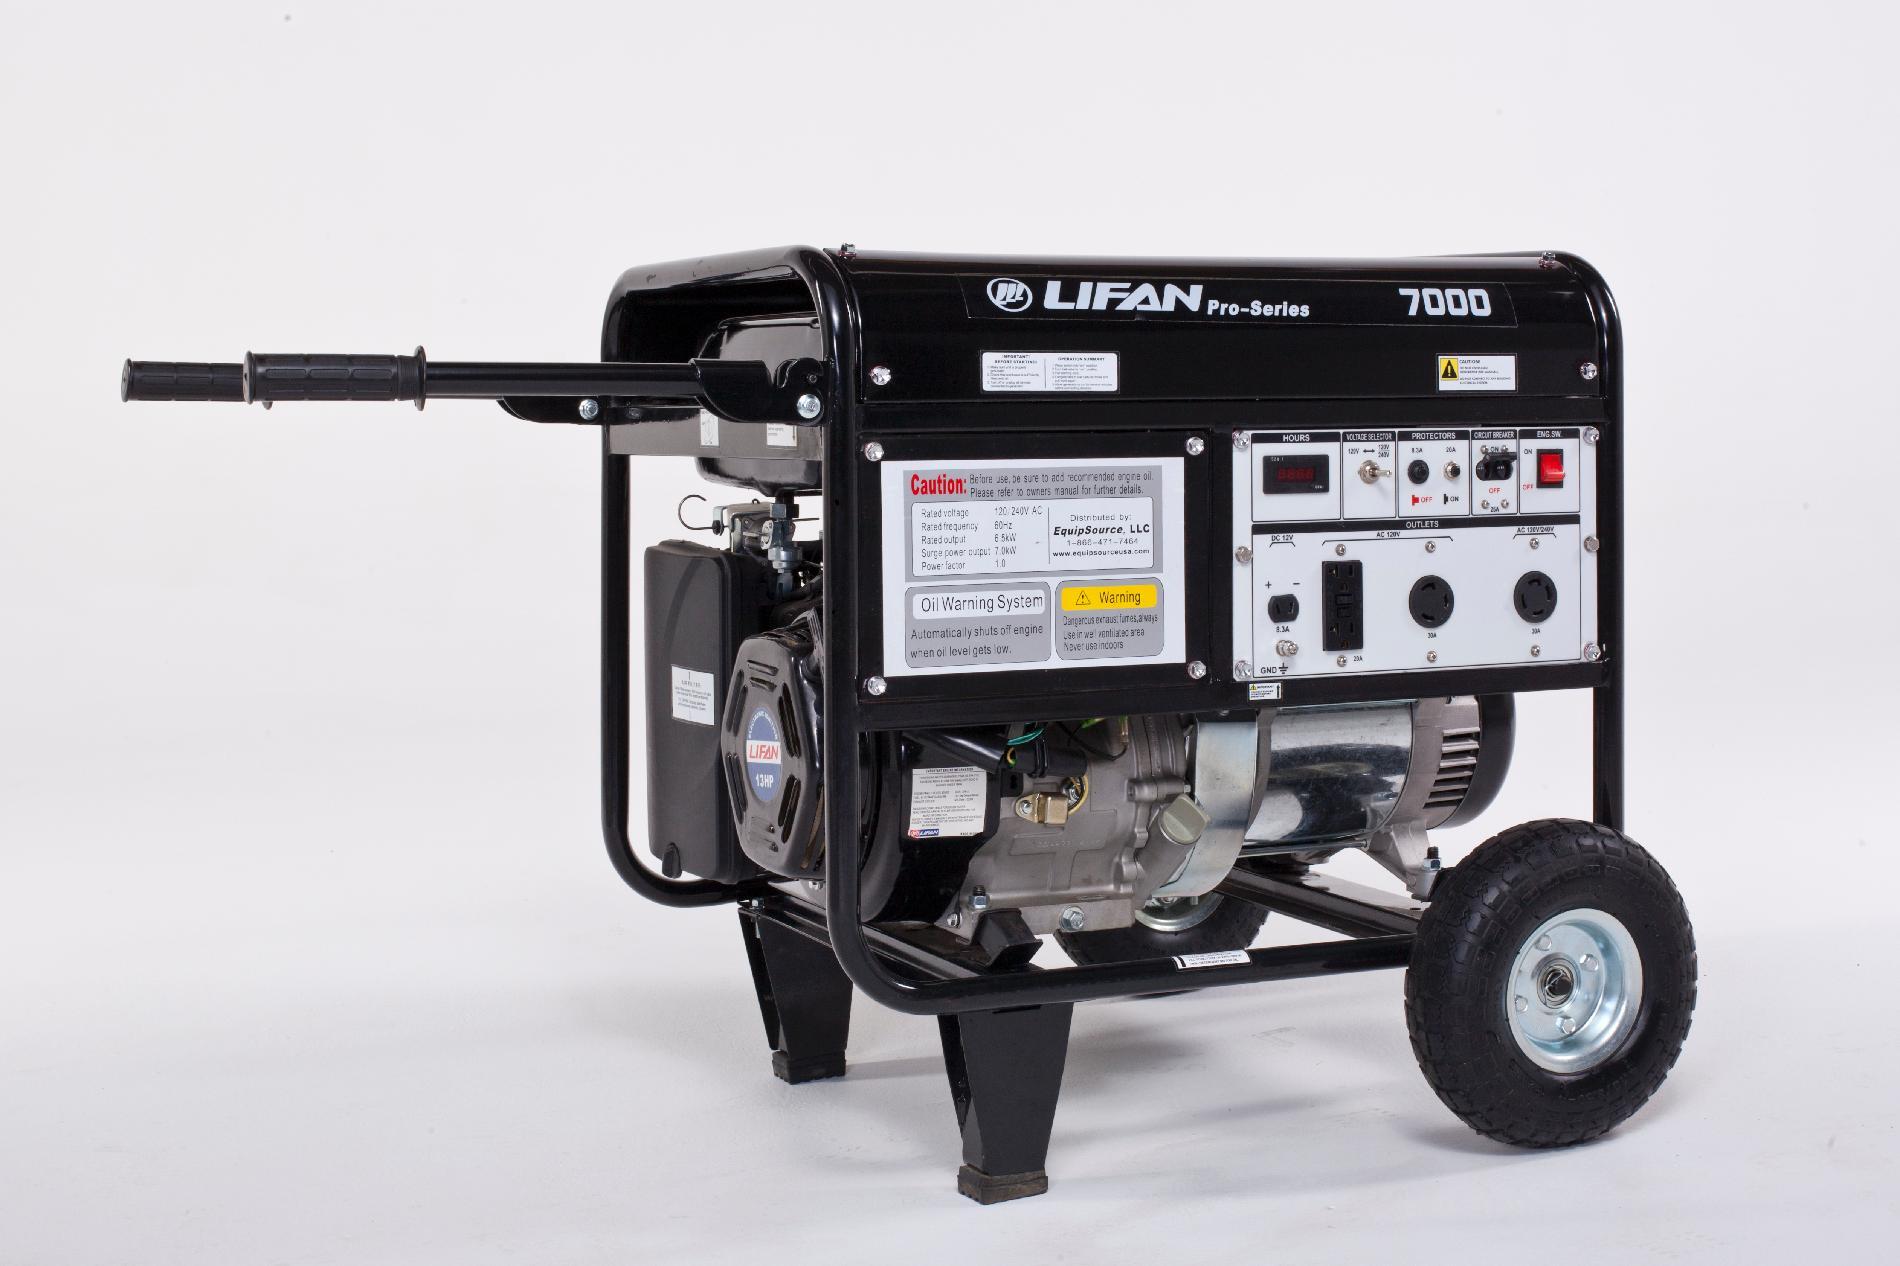 Lifan Pro-Series 7000 watt generator CARB compliant